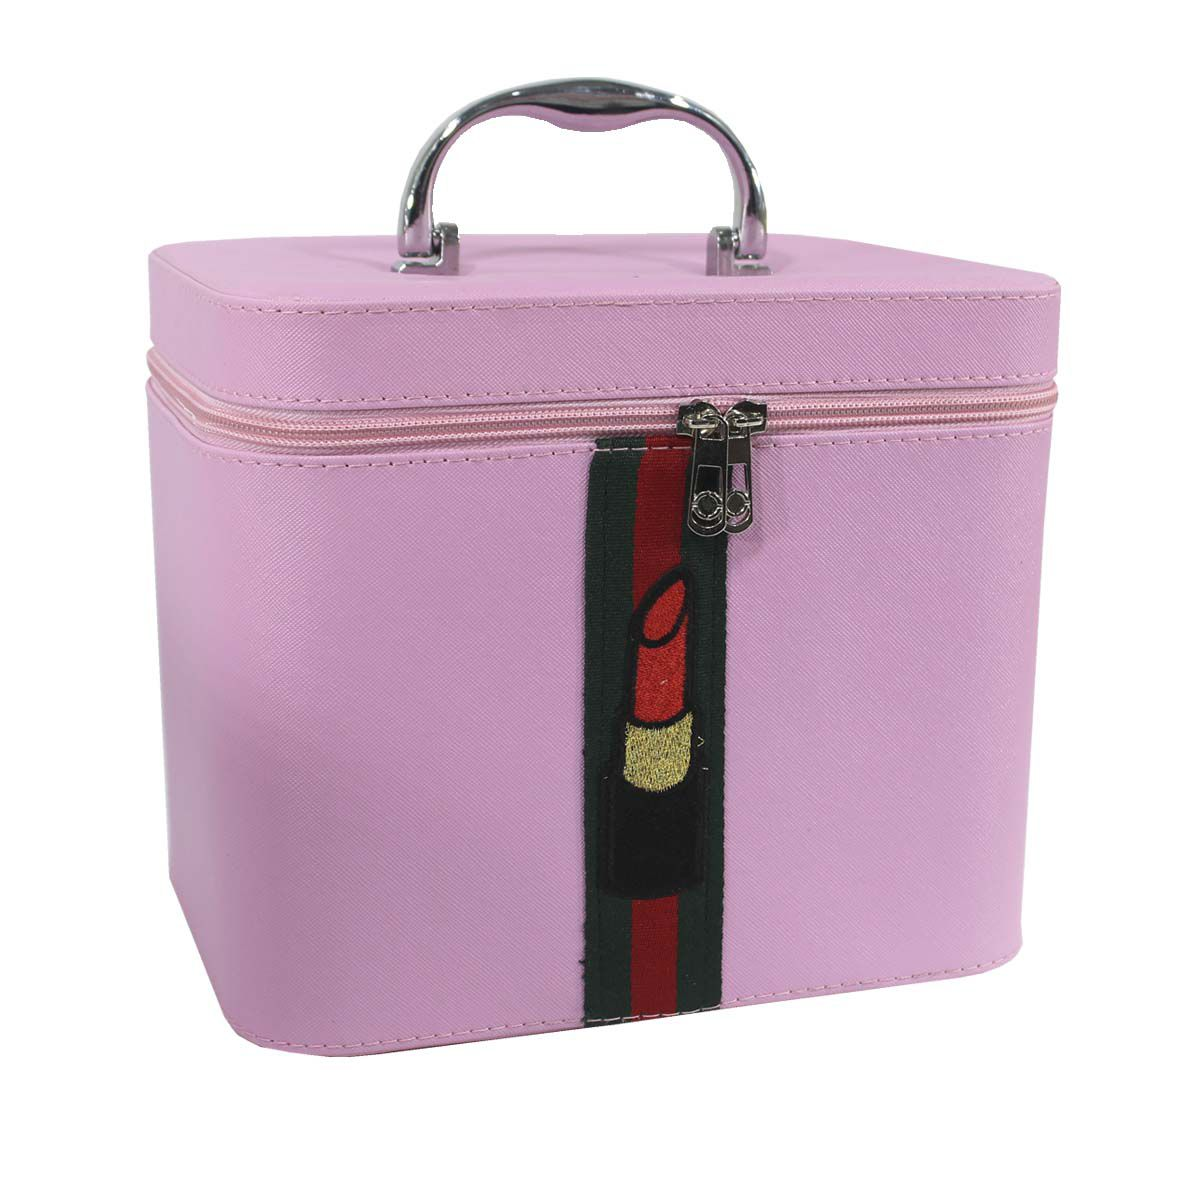 Maleta Frasqueira + Kit de  Maquiagens Completa Luisance e brindes BZ51